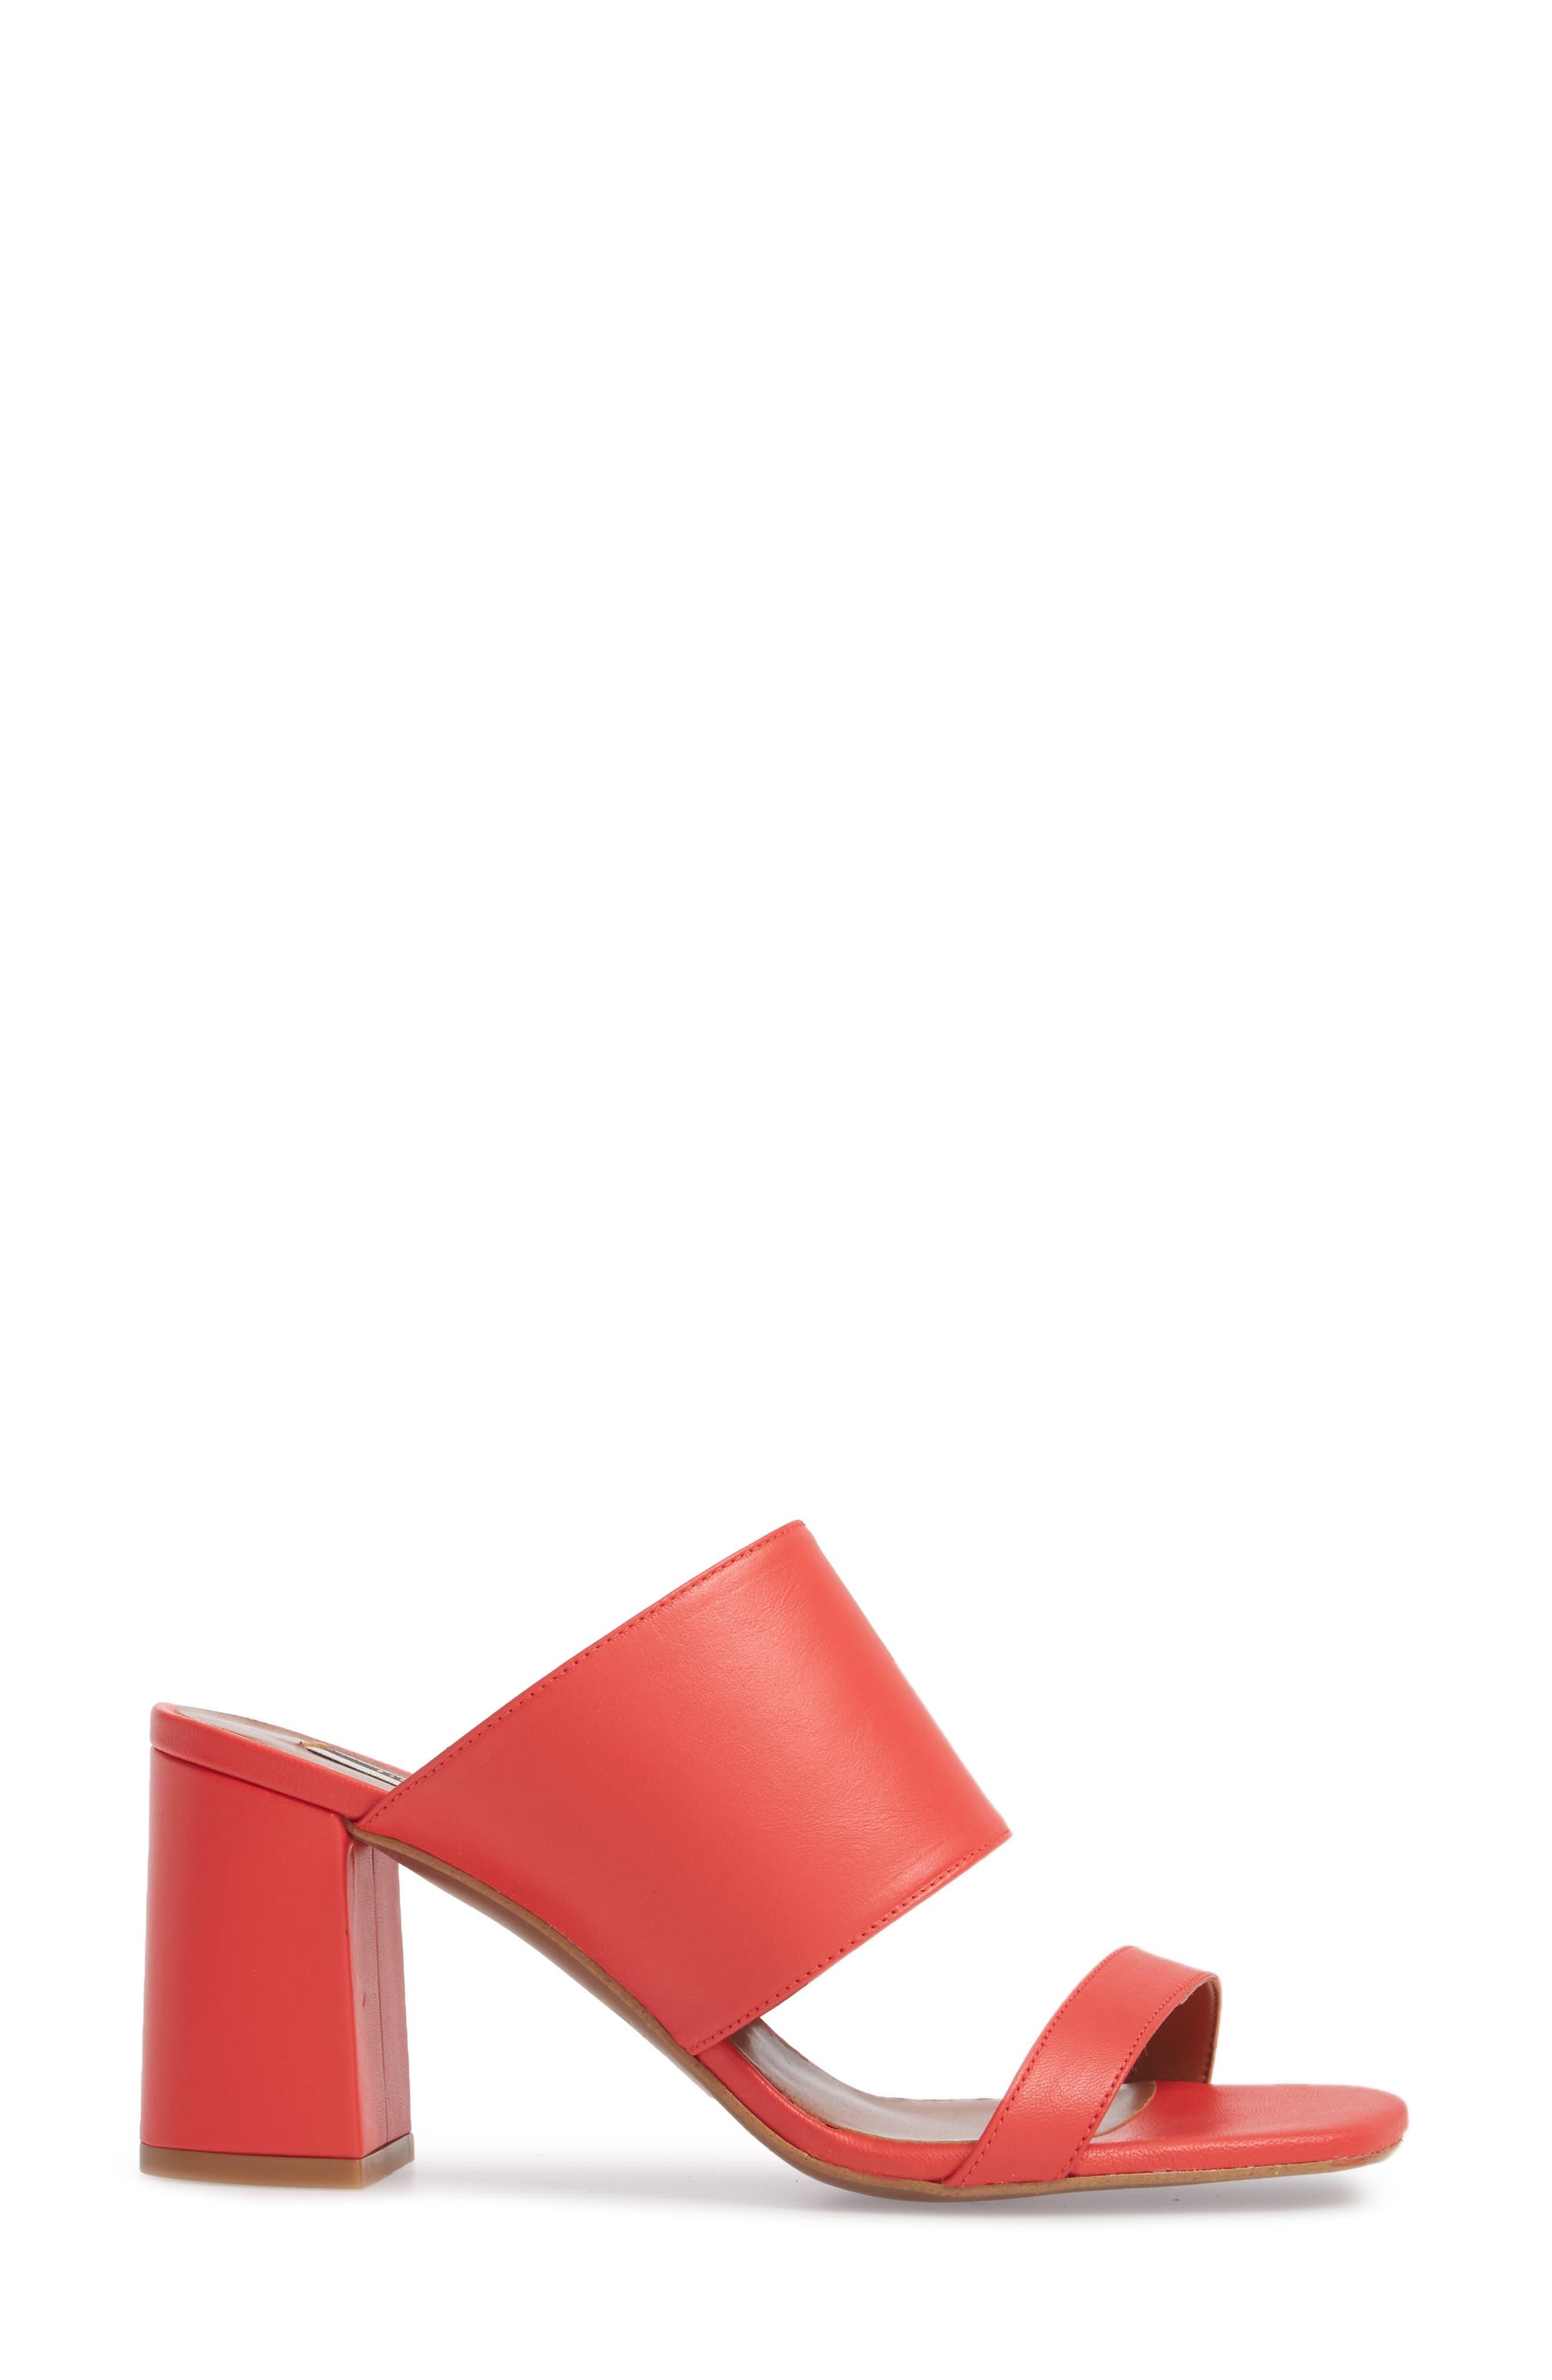 Nickle Mule Sandal,                             Alternate thumbnail 3, color,                             Red